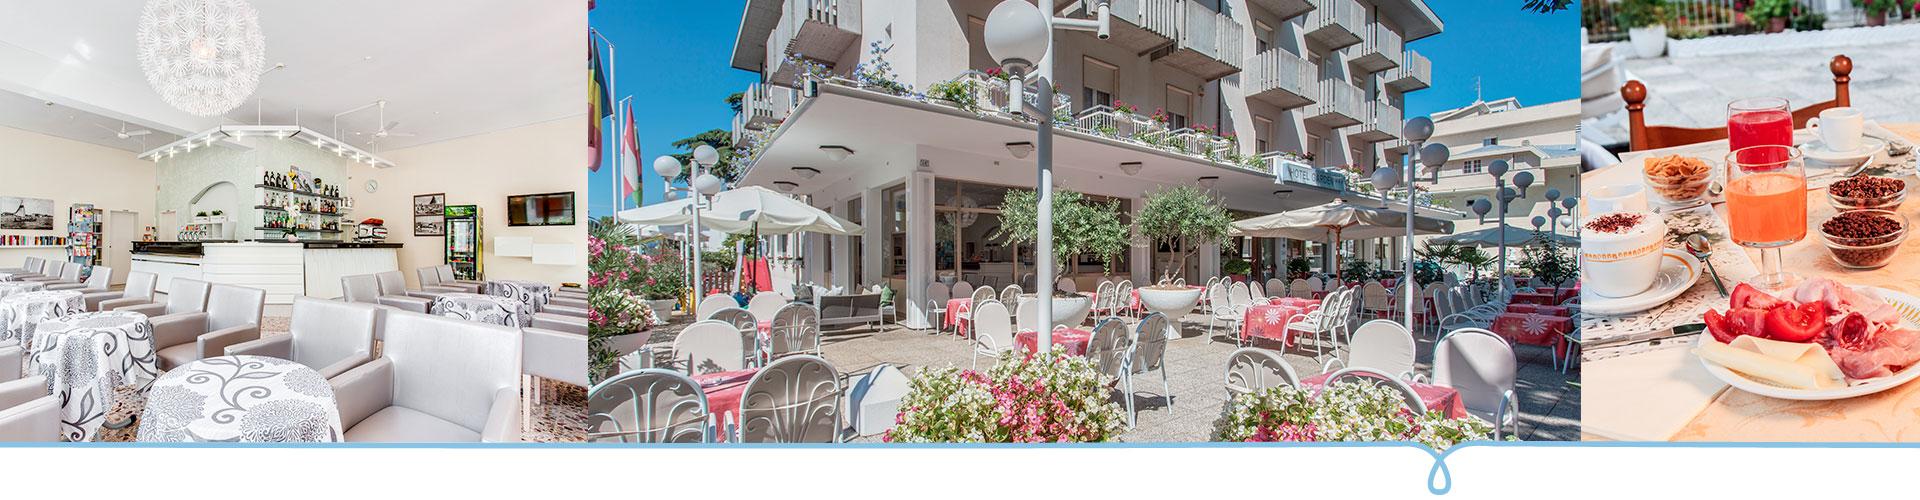 Preise Fur Vollpension Und All Inclusive In Italien Adria Hotel